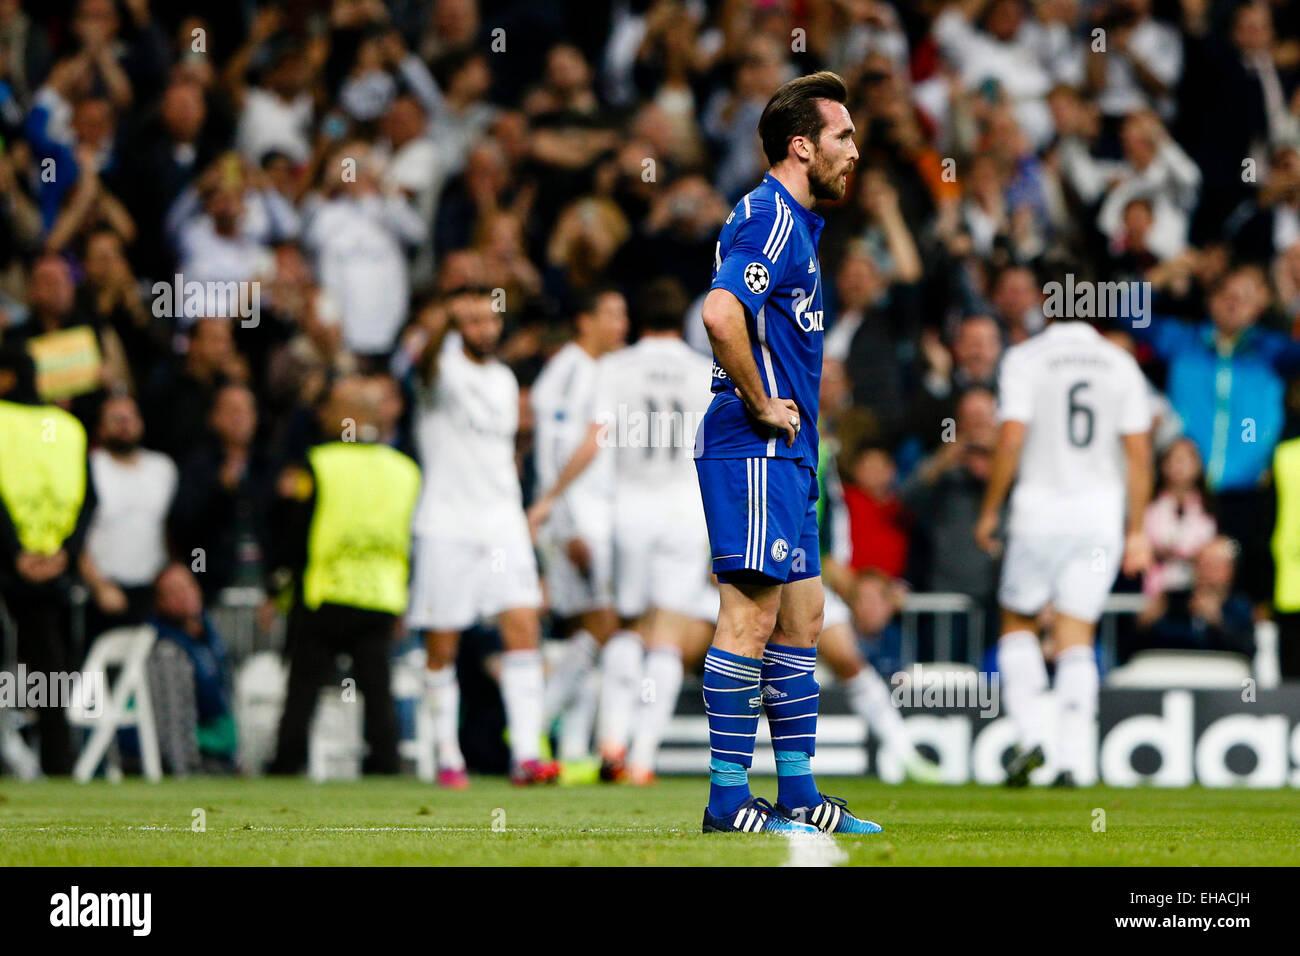 Madrid, Spain. 10th March, 2015. EUFA Champions League football. Real Madrid versus FC Schalke. 7 Cristiano Ronaldo - Stock Image